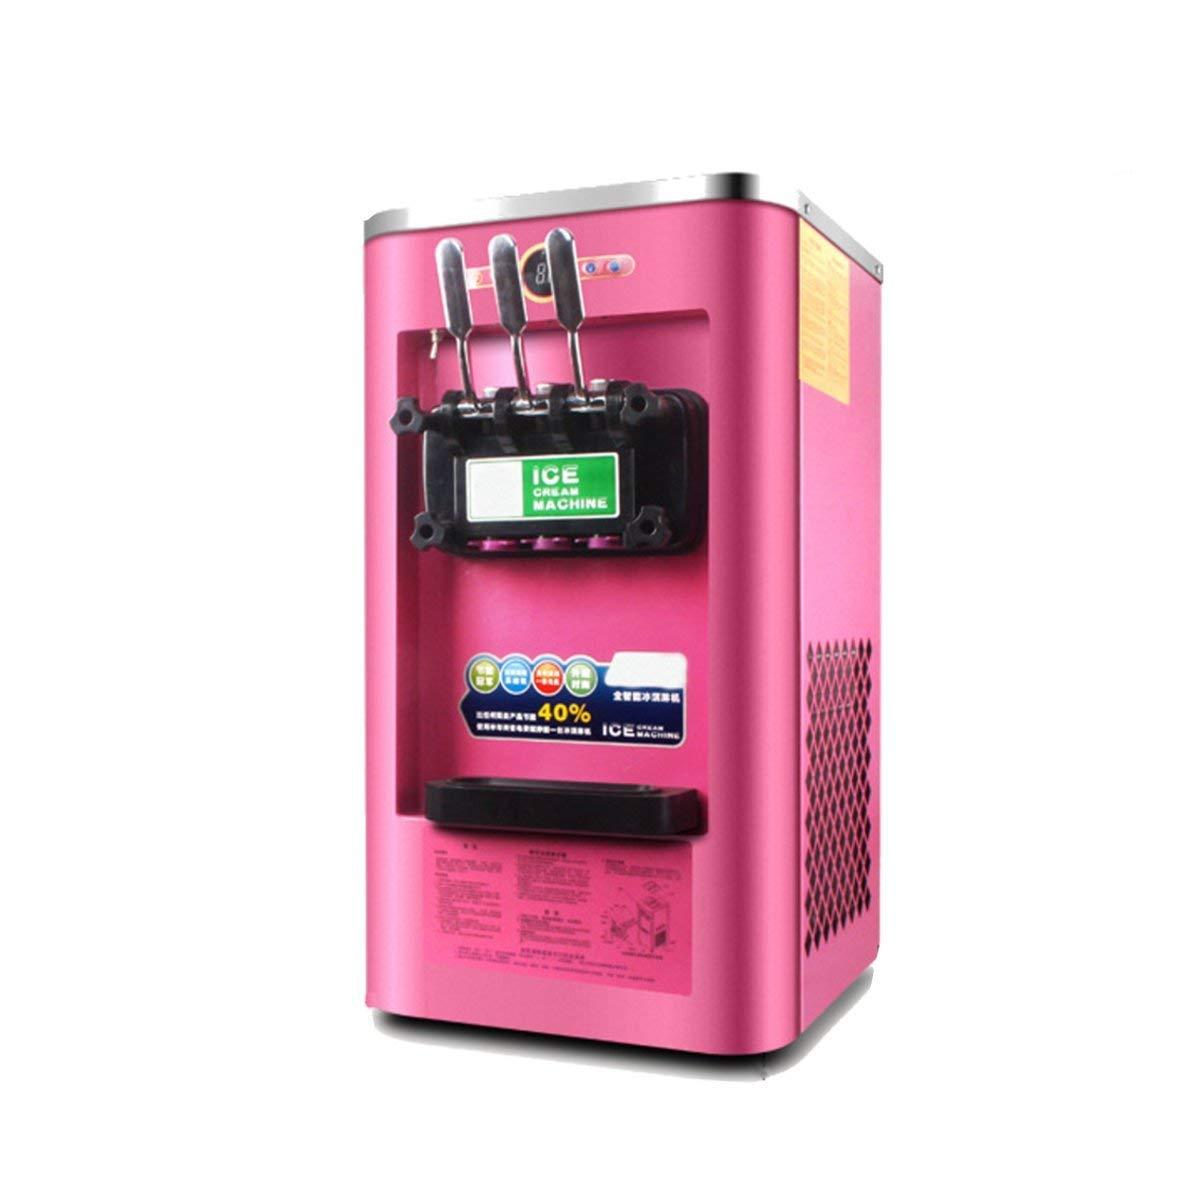 220V Commercial Soft Ice Cream Machine Frozen Yogurt Mix 3 Flavor 13-16L/H